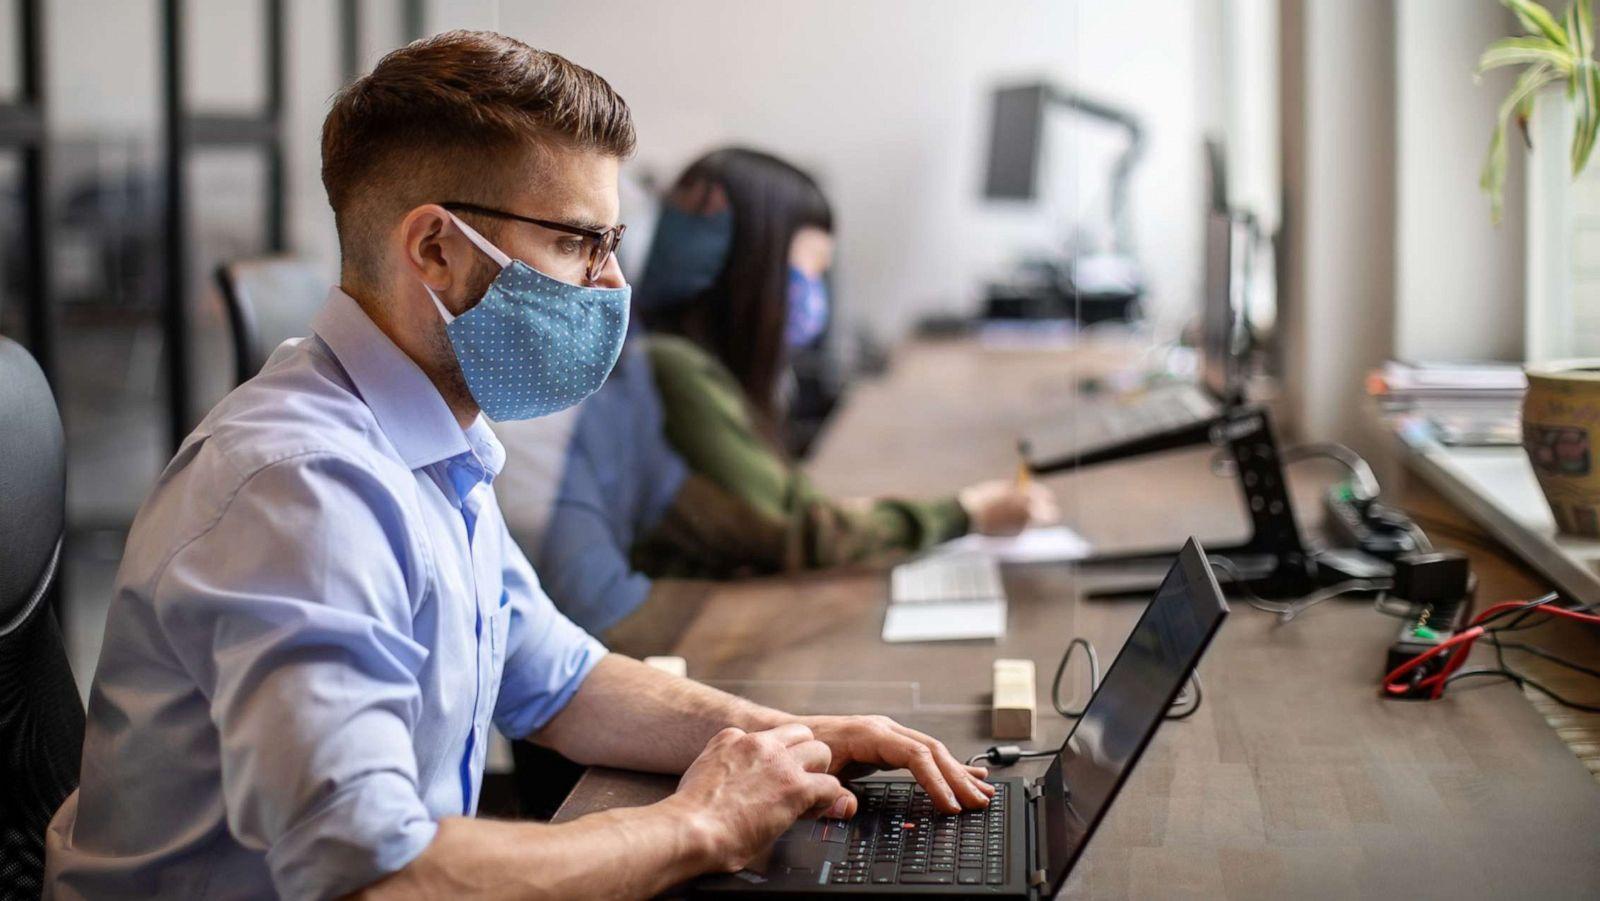 FBI Says U.S. Health Care System Under Ransomware Threat